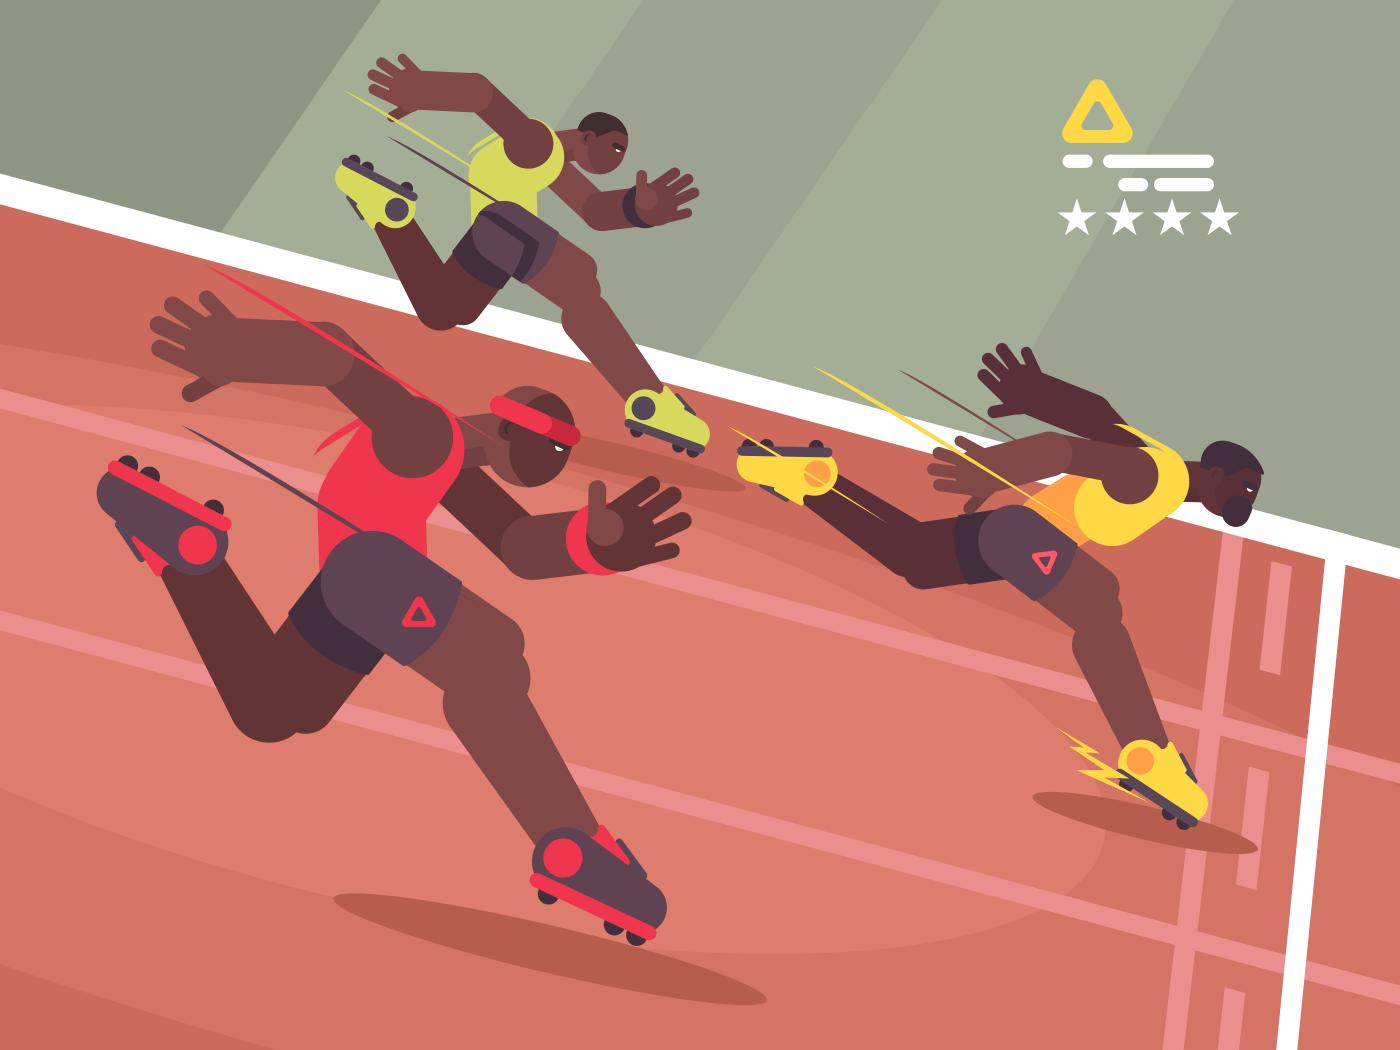 Athletics competition sprint. Athlete runs to finish line. Vector illustration